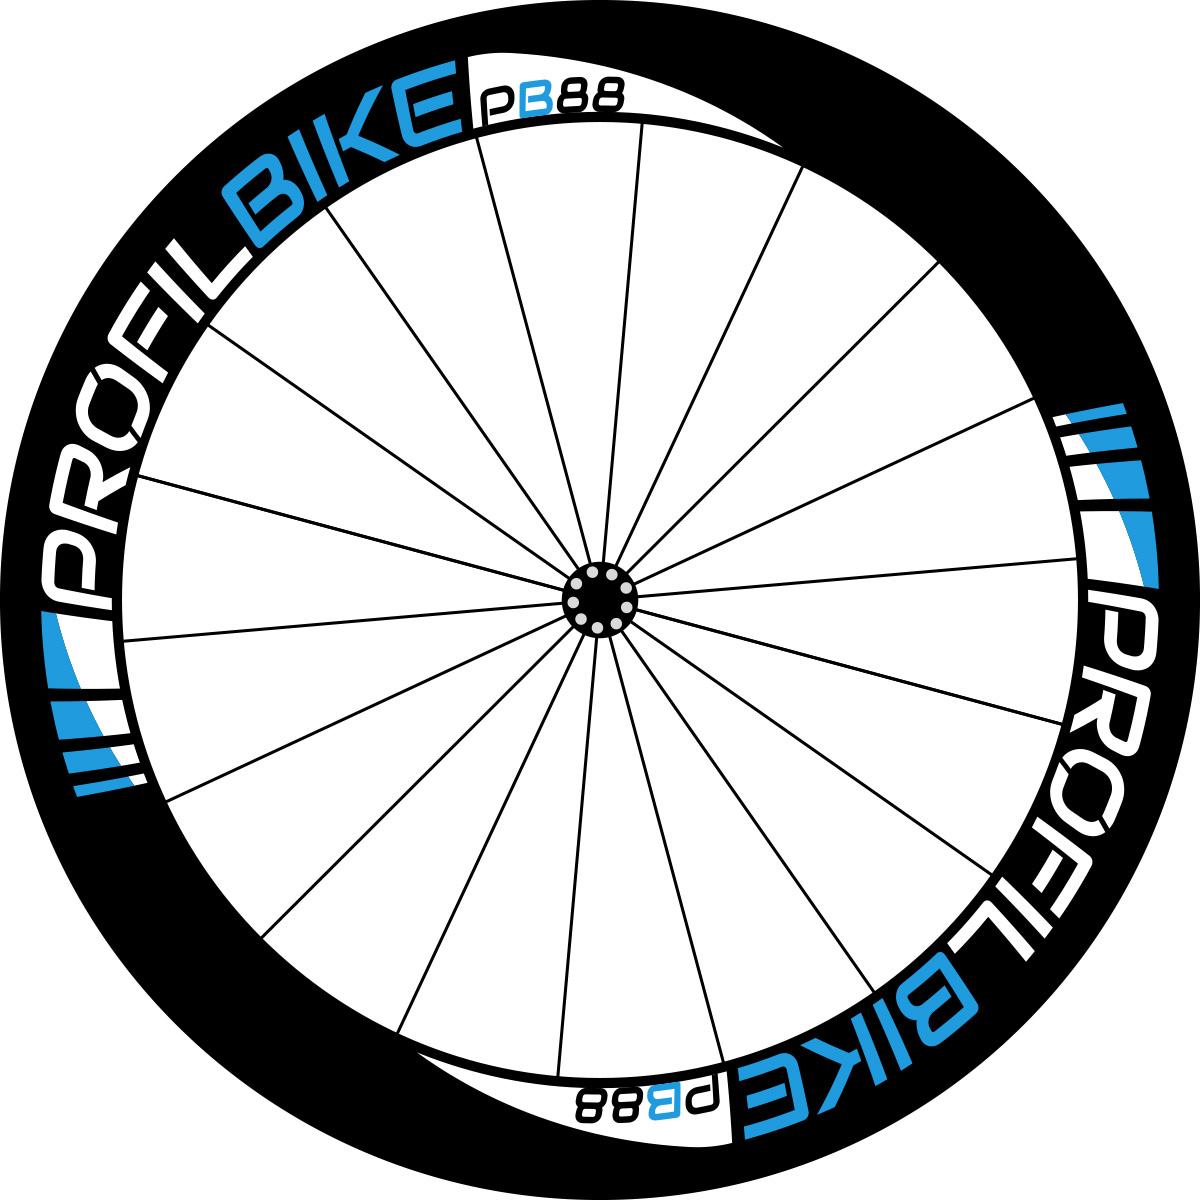 Profilbike PB88 CARBON design bleu